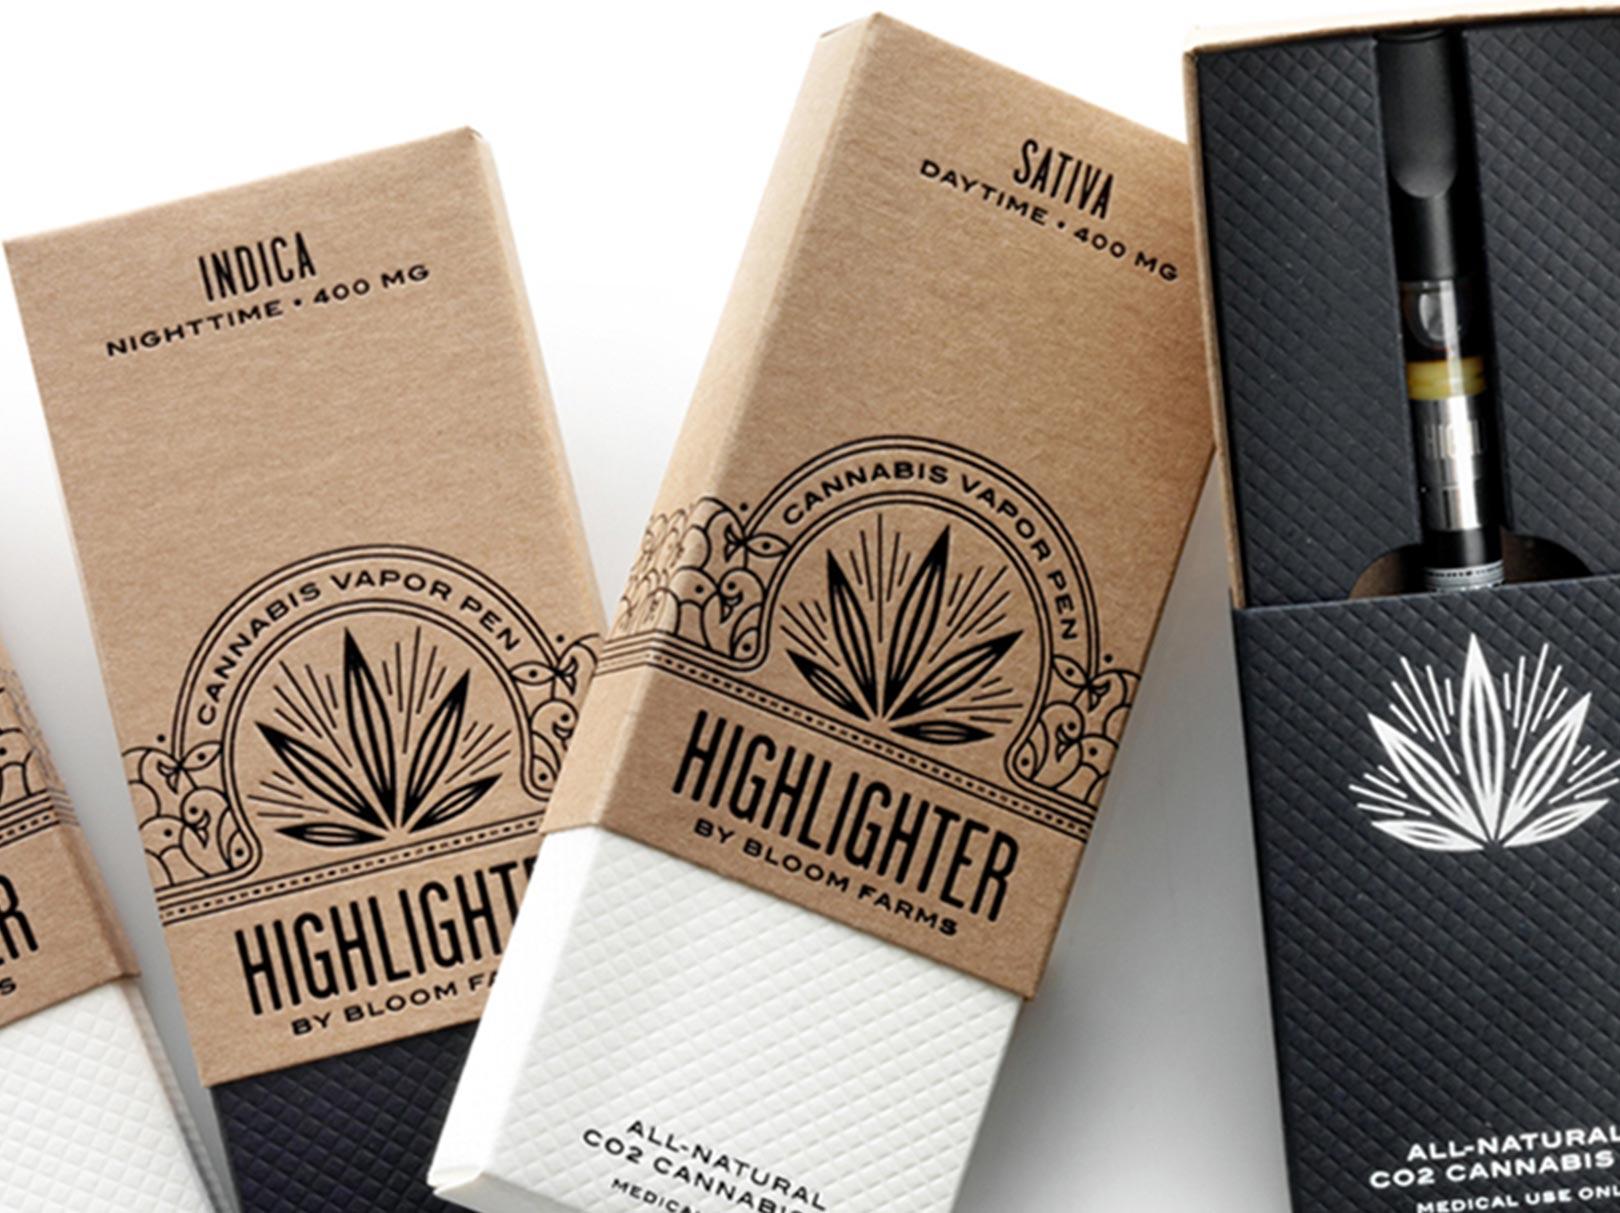 vancouver-cannabis-branding-companies-marijuana-package-design-canada-zesty